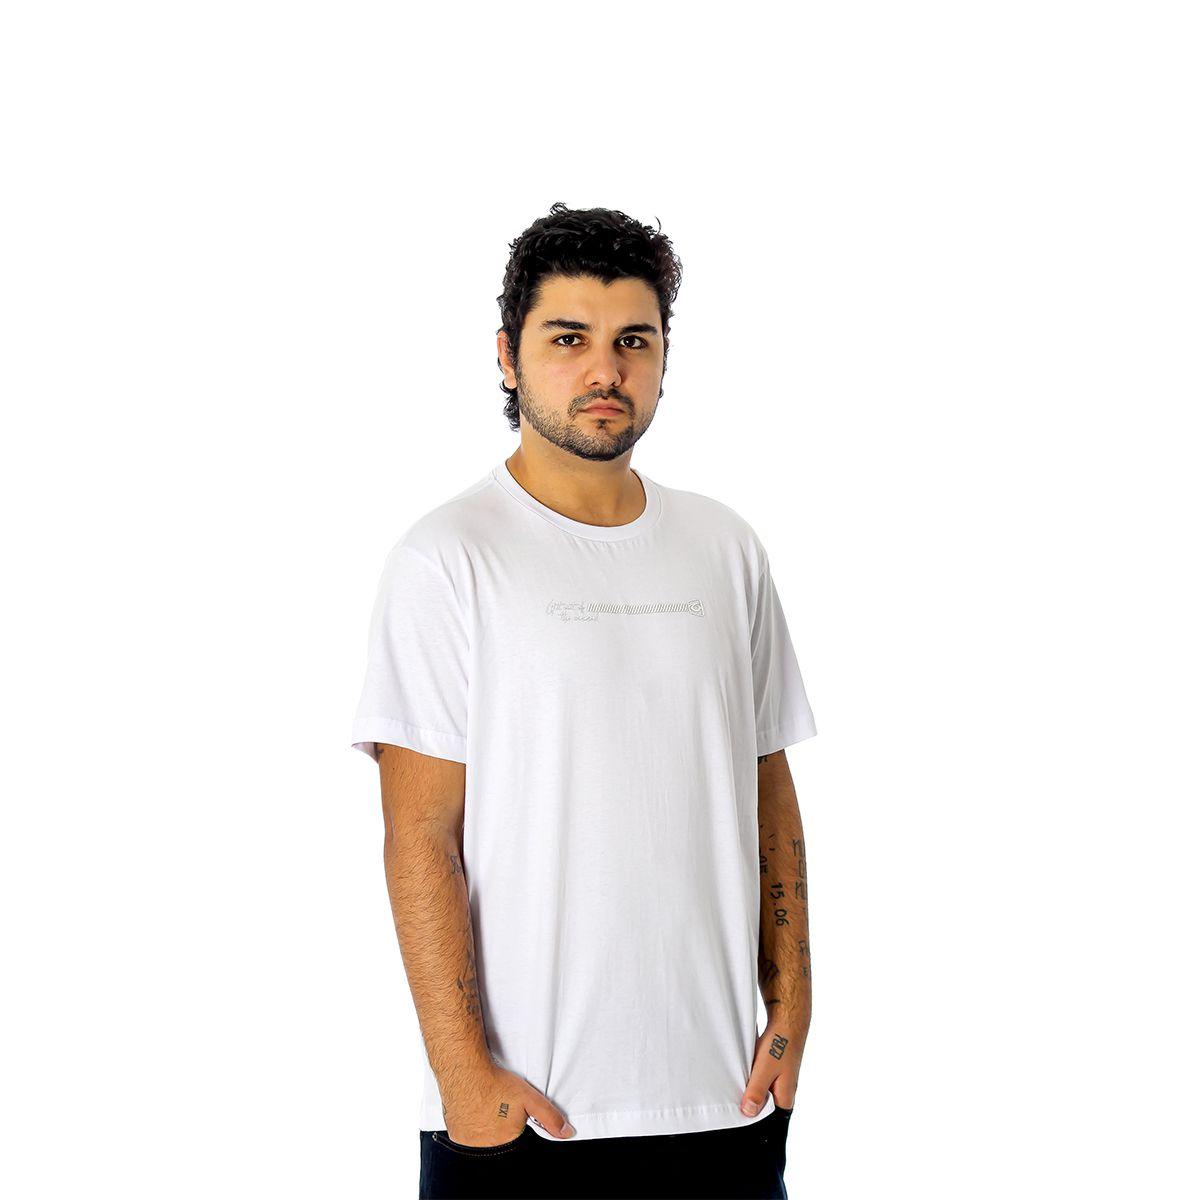 Camiseta Masculina Estampada Gangster 10.01.9965